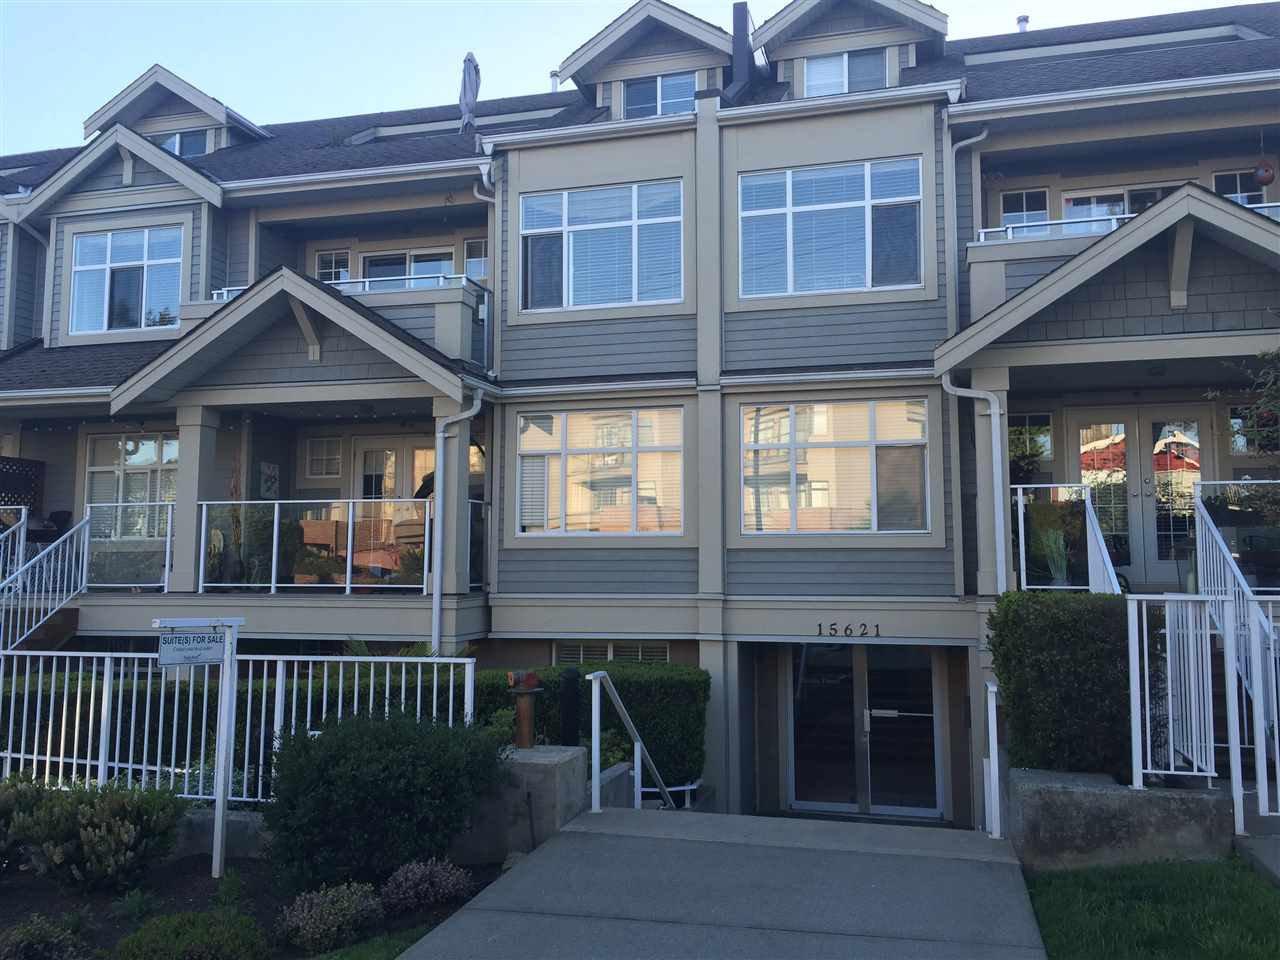 "Main Photo: 401 15621 MARINE Drive: White Rock Condo for sale in ""Pacific Pointe"" (South Surrey White Rock)  : MLS®# R2066645"